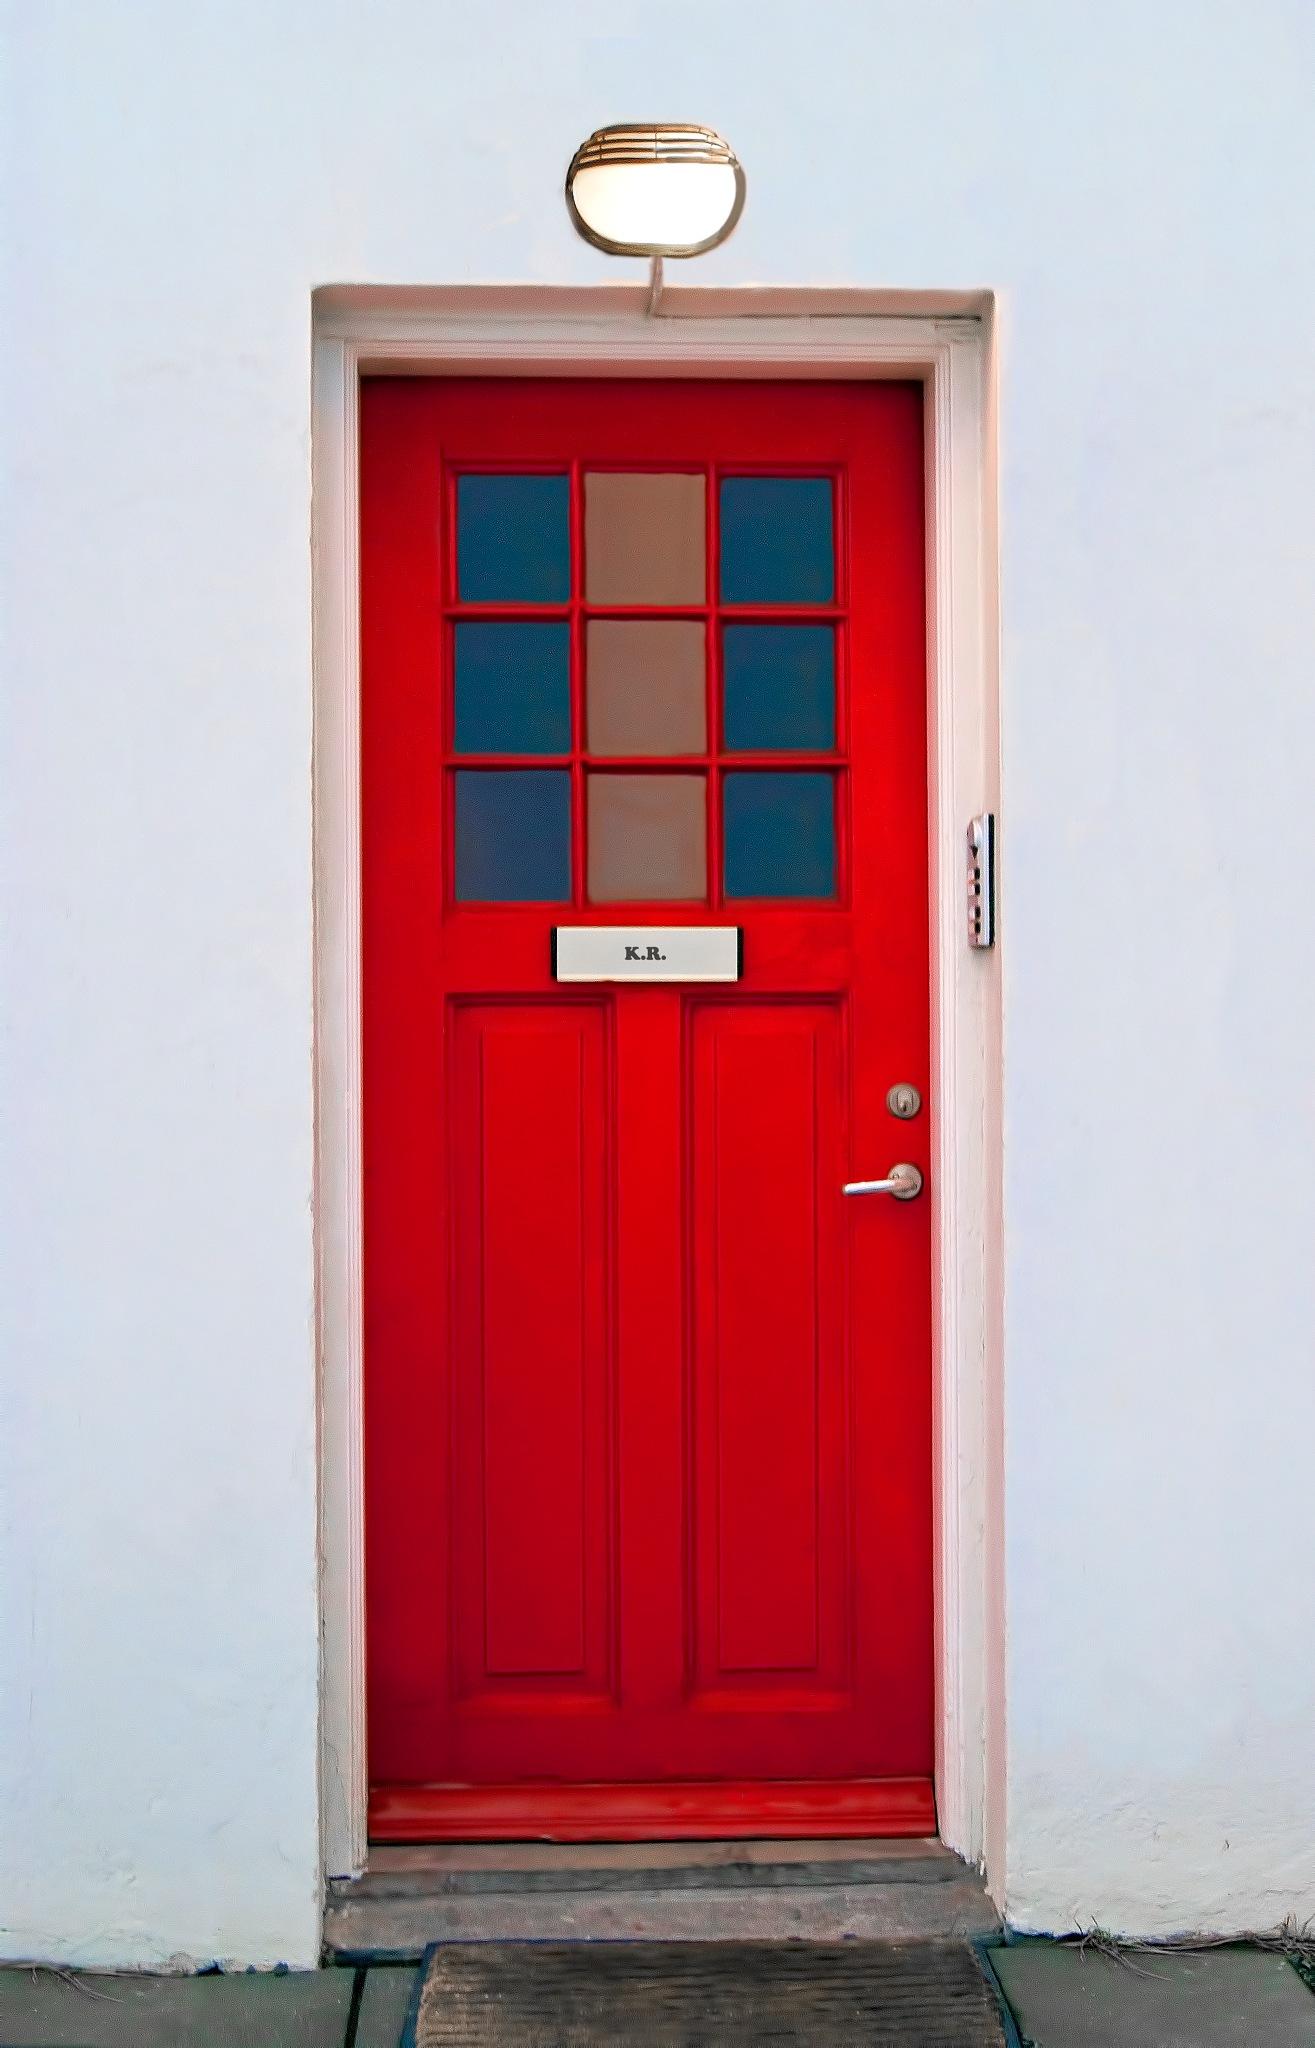 The Red Door. by Konrad Ragnarsson